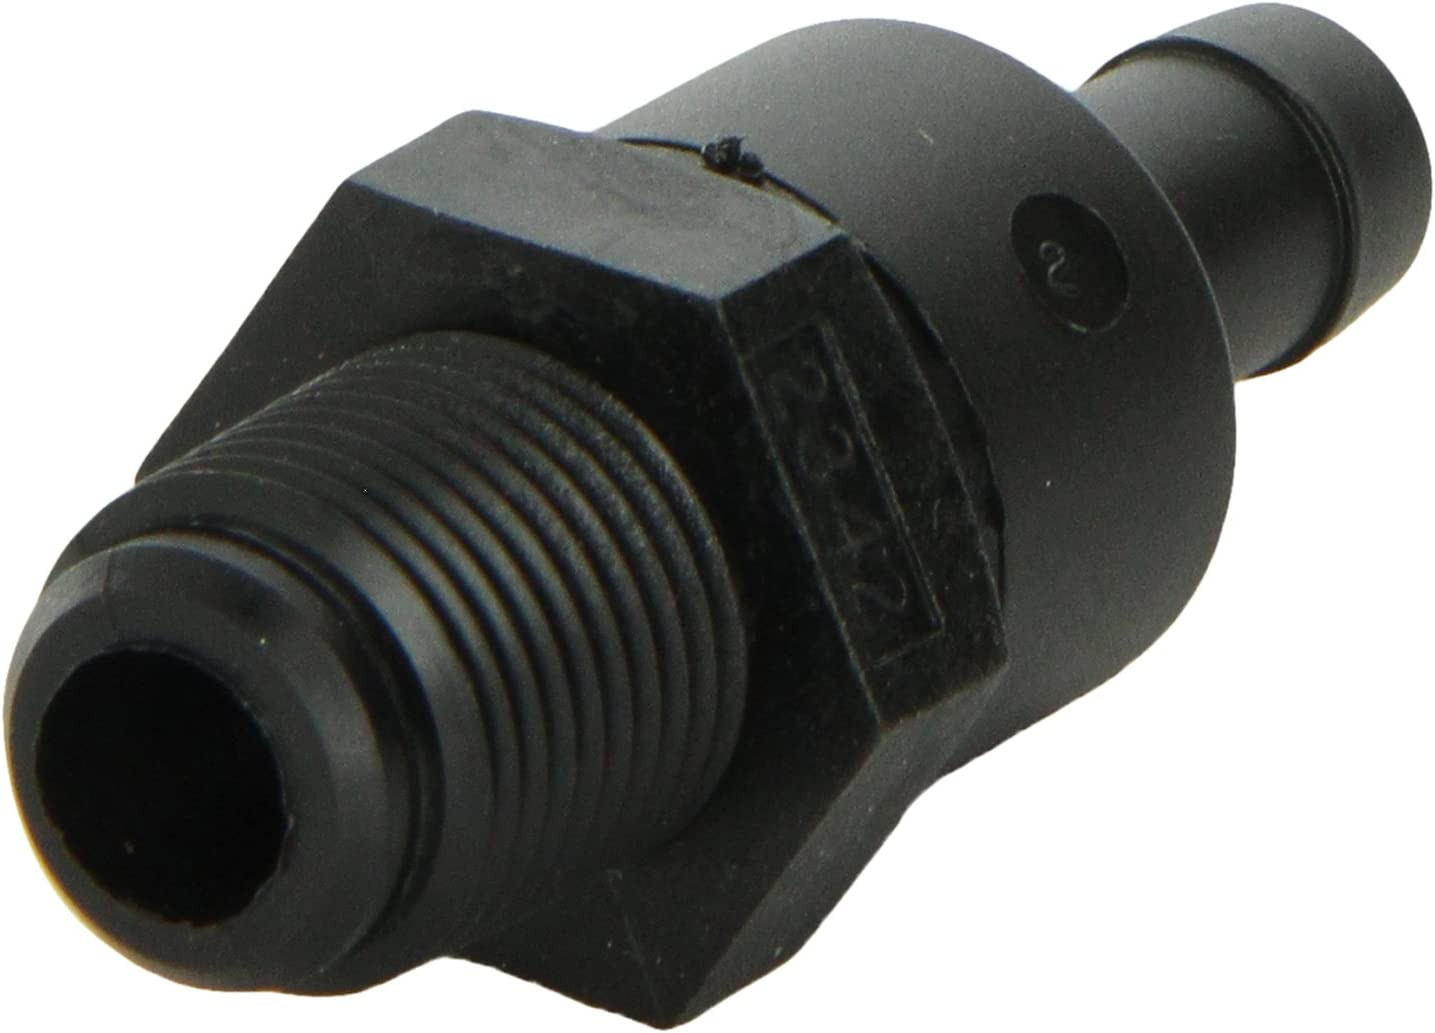 PCV Valve Standard V368